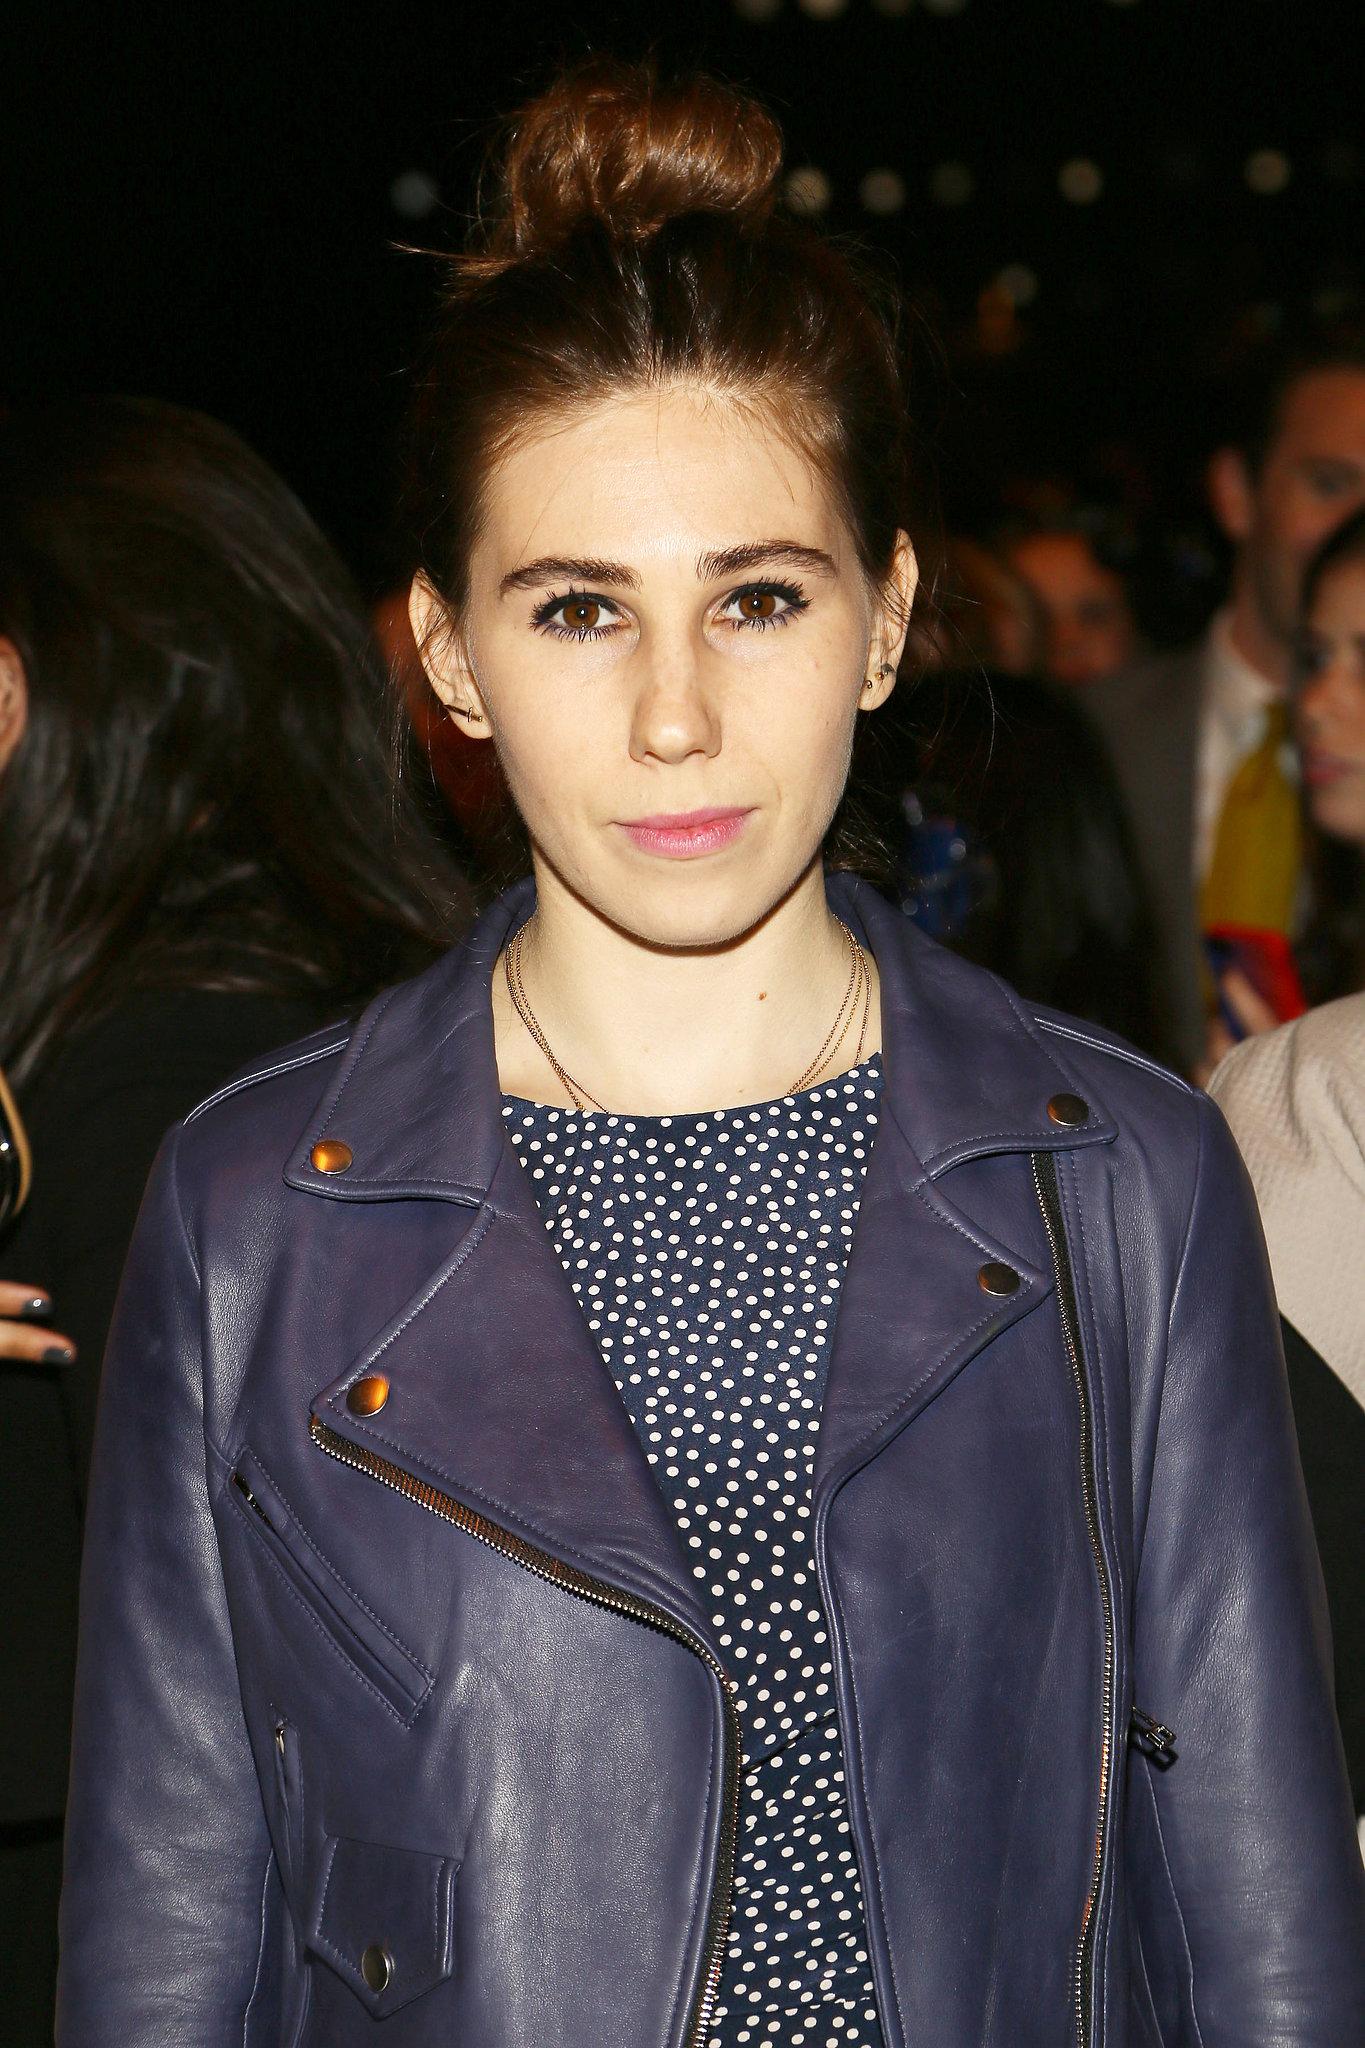 Zosia Mamet at Rebecca Minkoff Spring 2014.